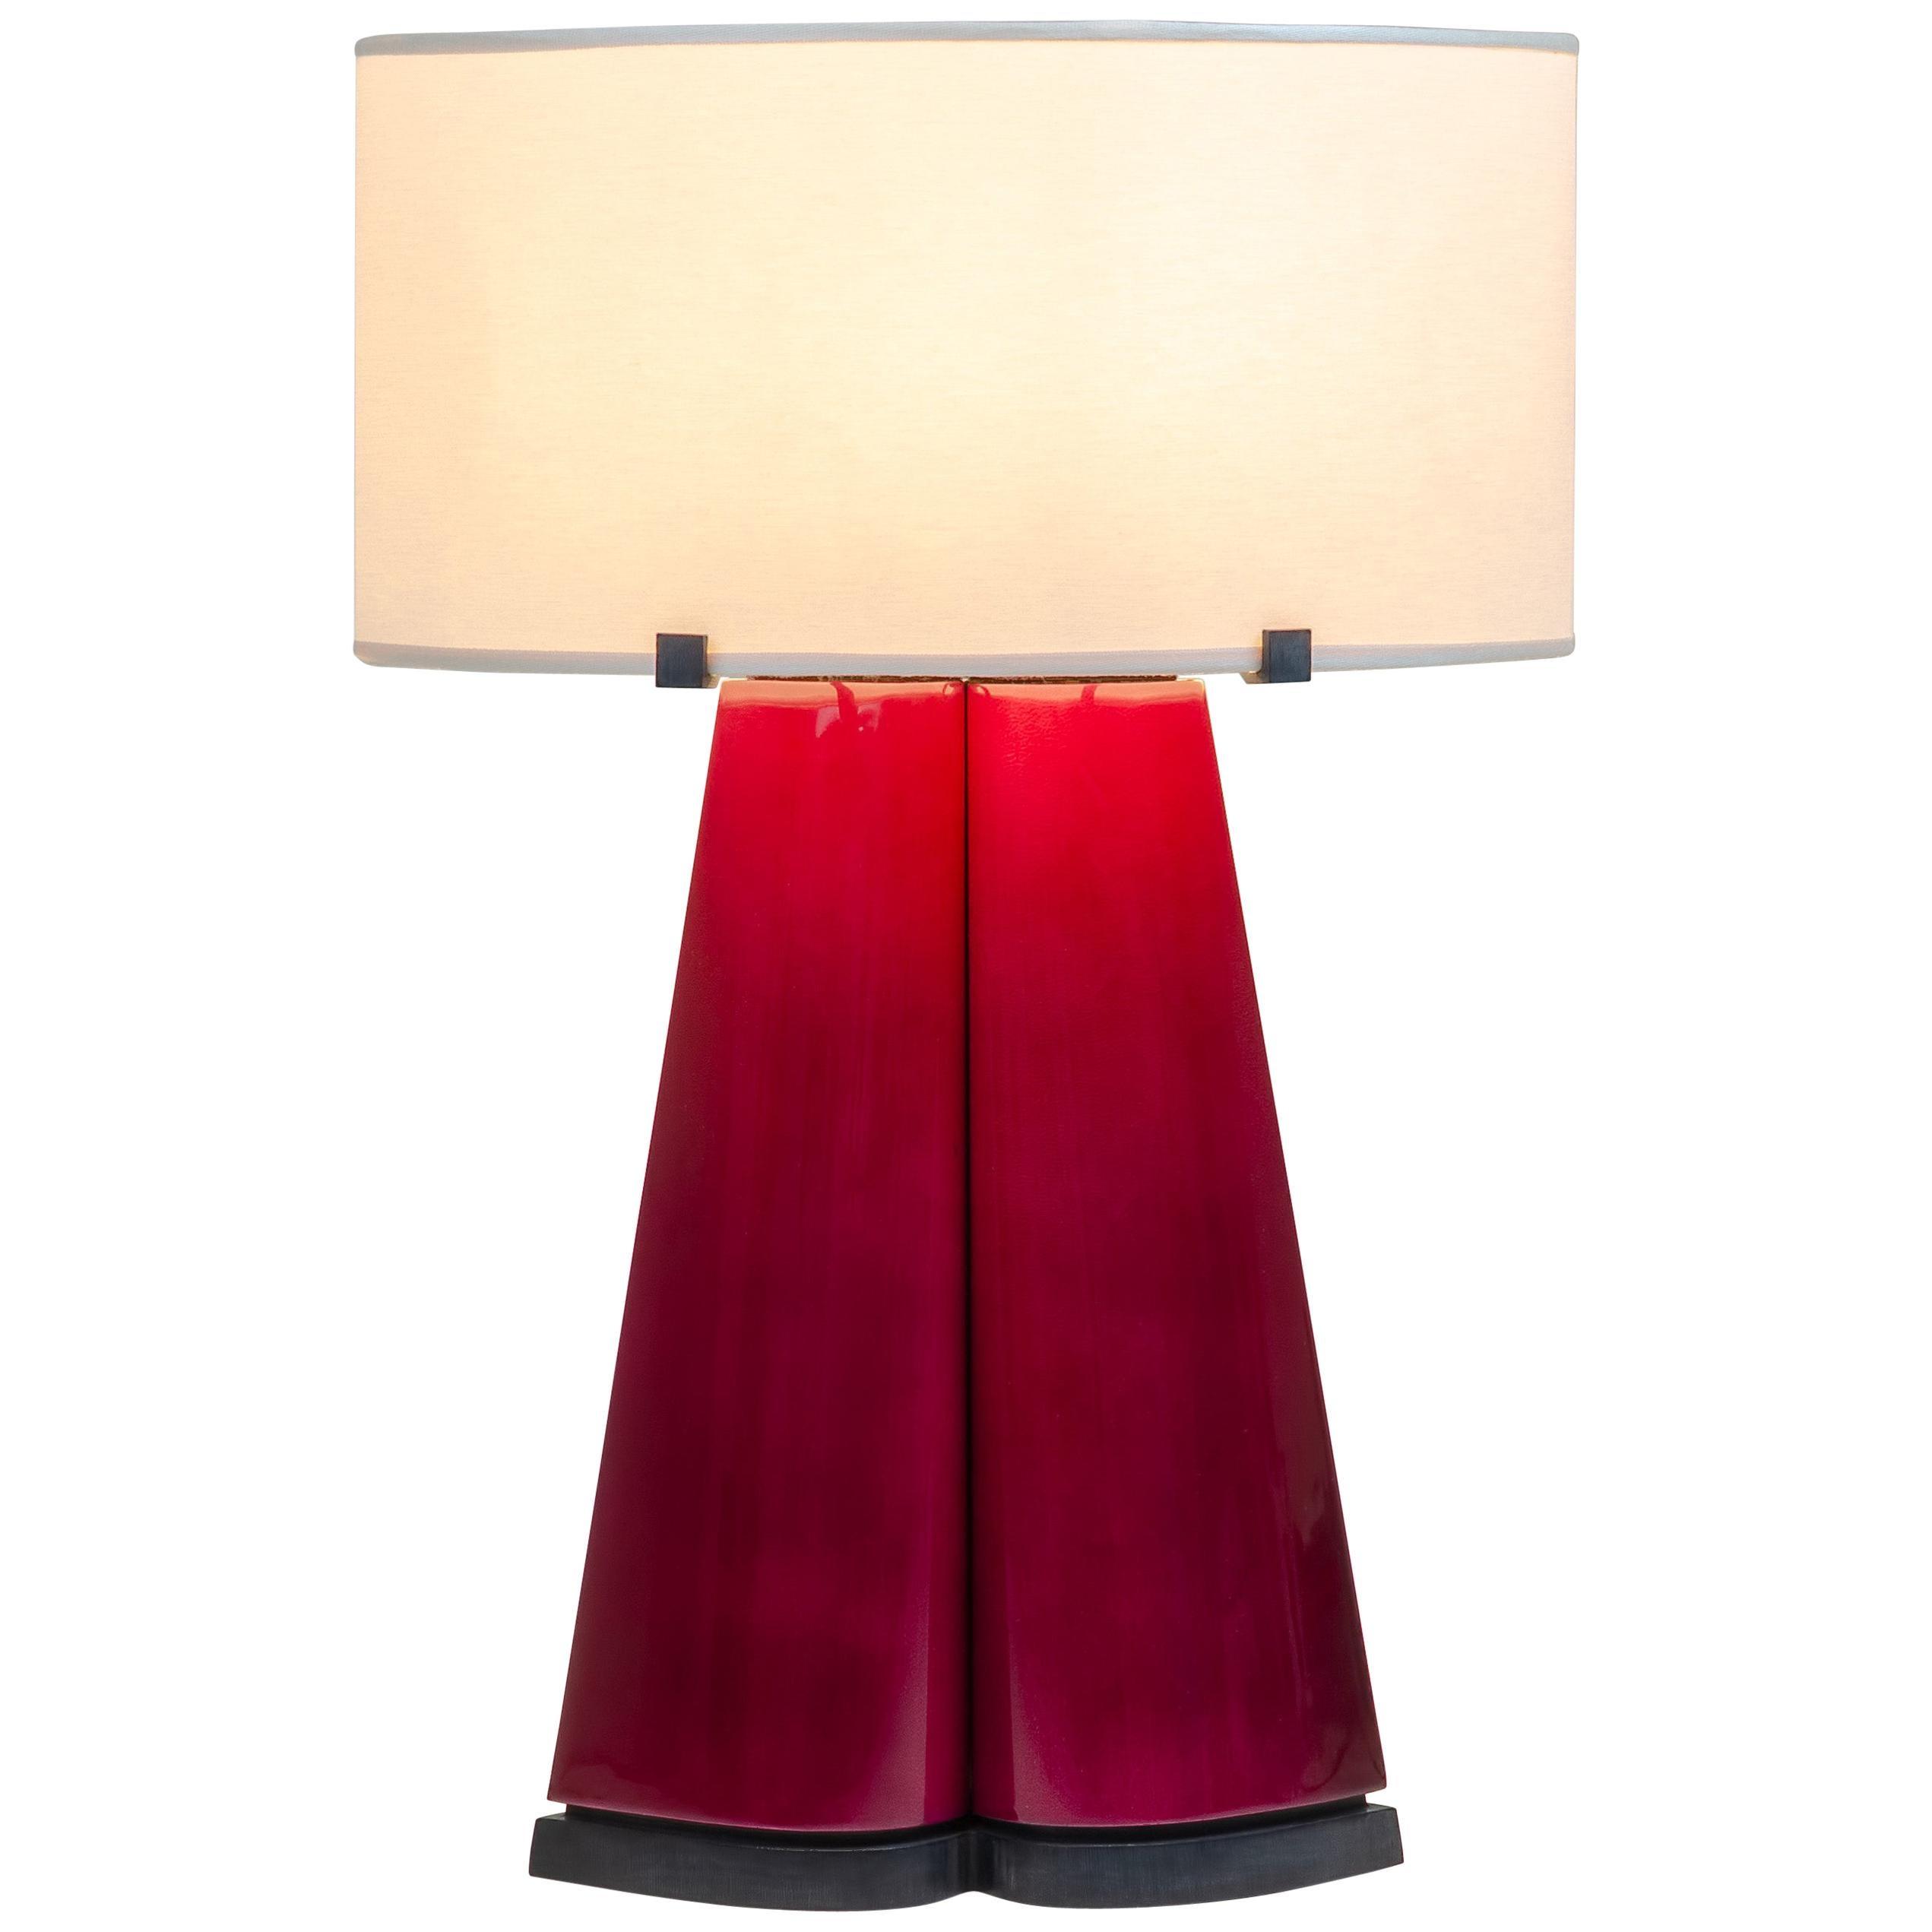 "Achille Salvagni ""Sotirio Red"" Table Lamp, Parchment and Bronze, Contemporary"